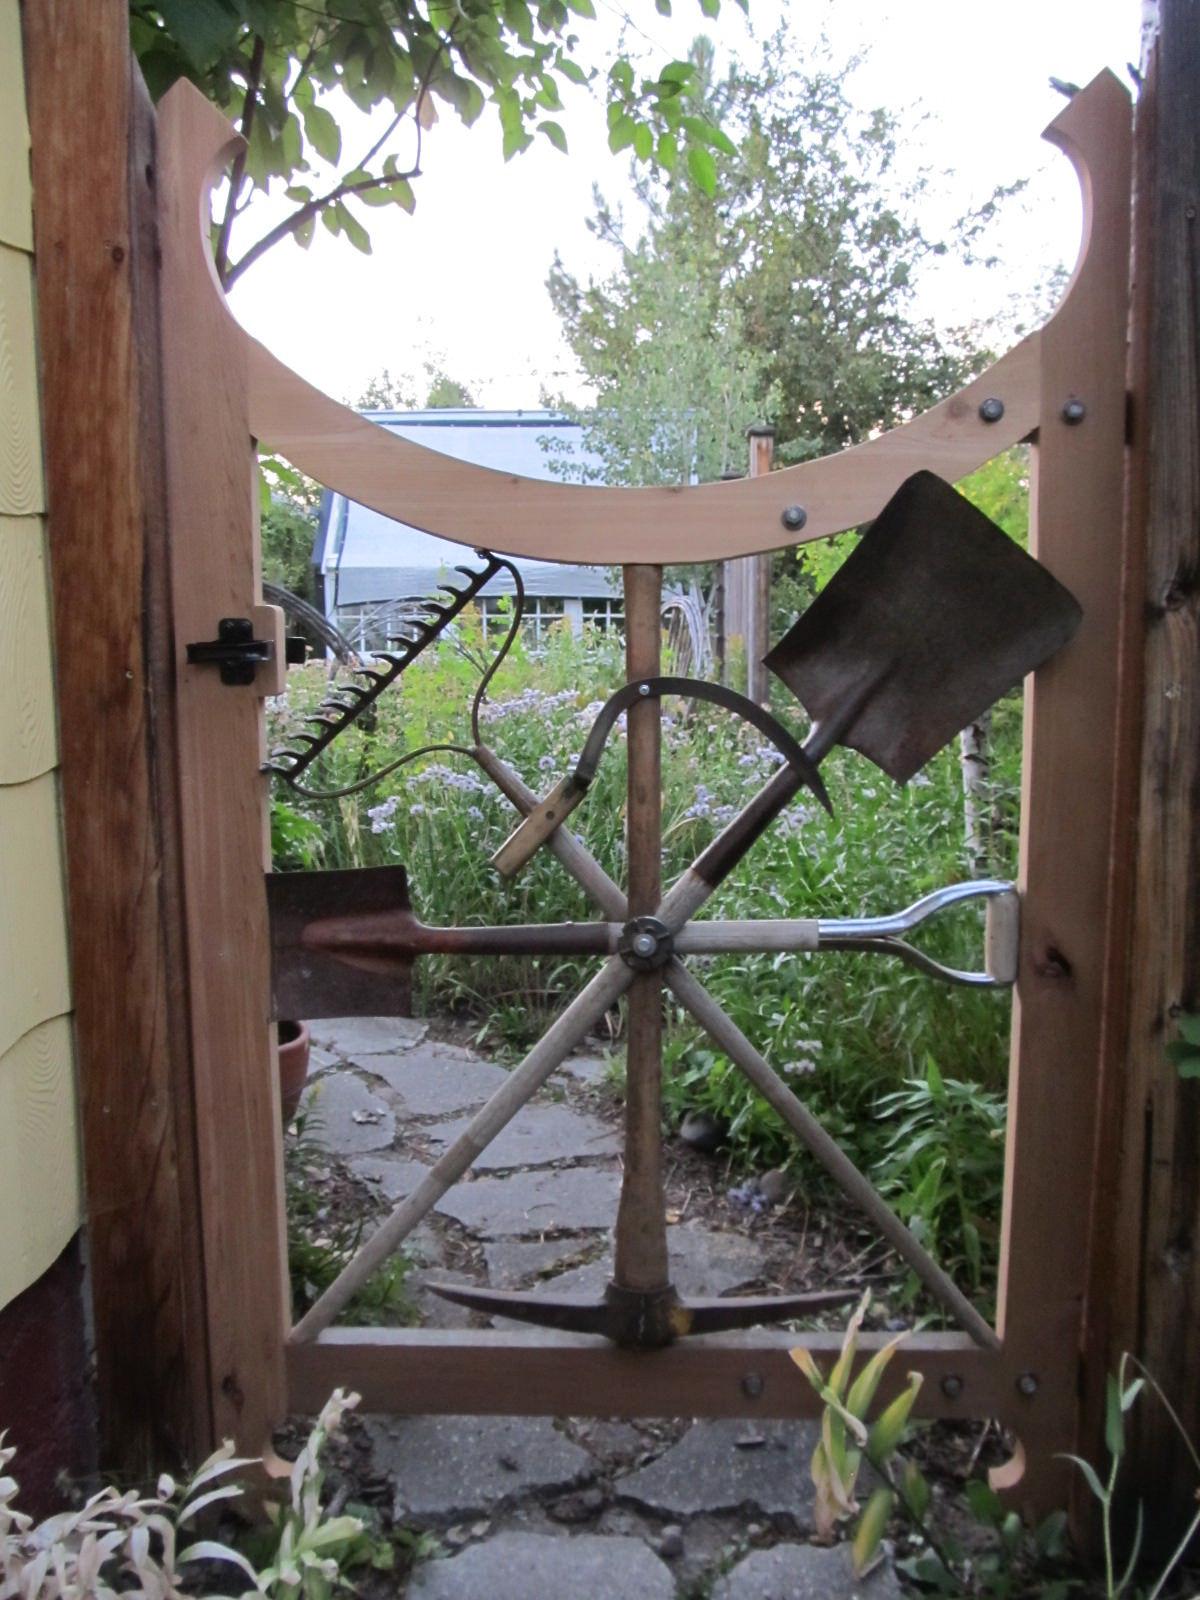 Unique outdoor home d cor ideas custom sunflower theme iron garden gate Andrew T Crawford